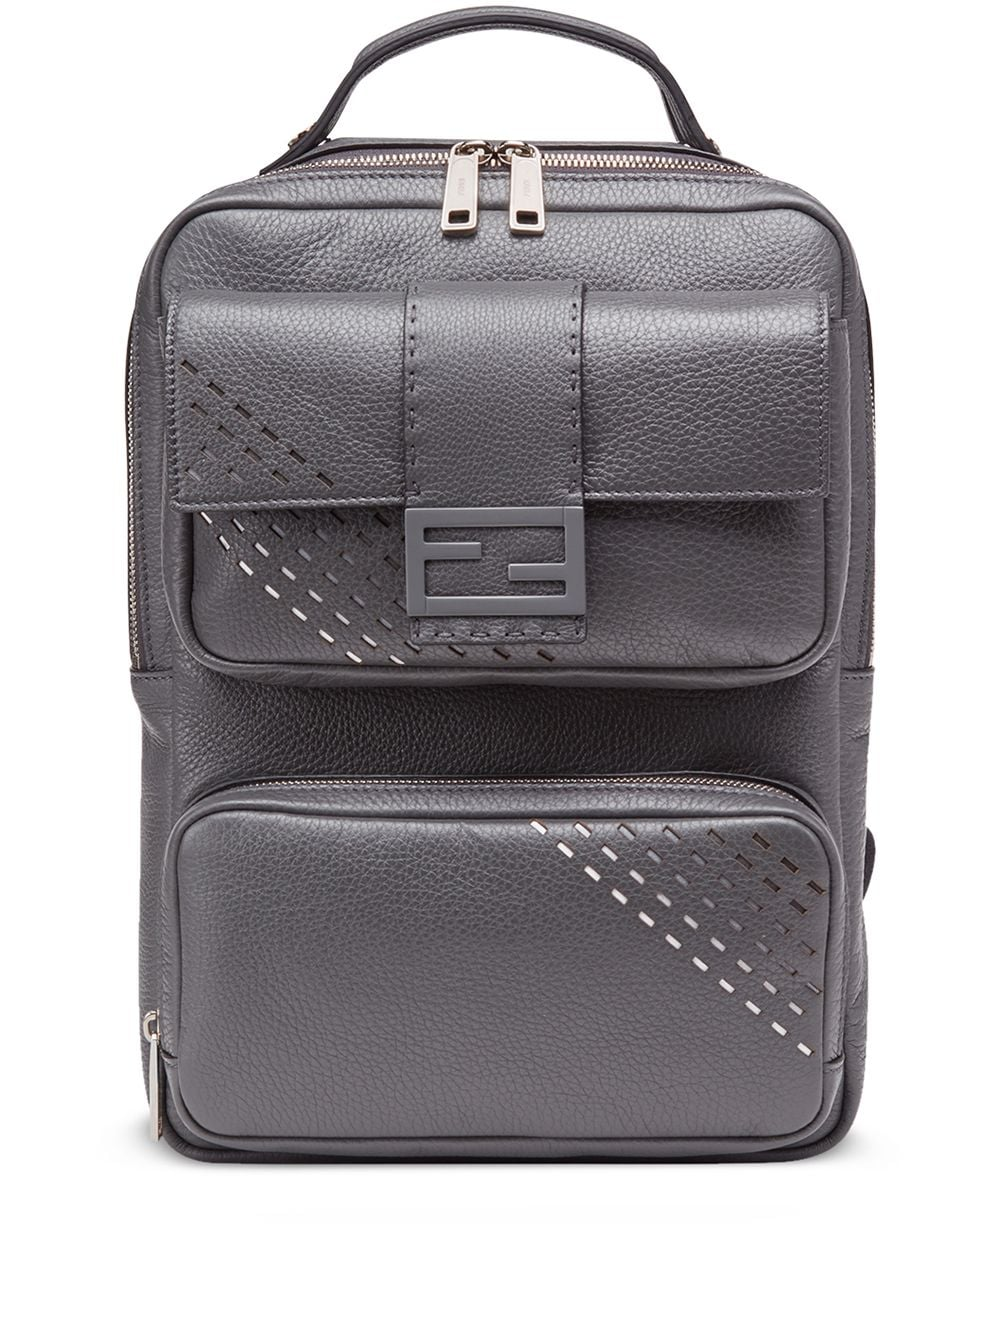 Leather Bakcpack